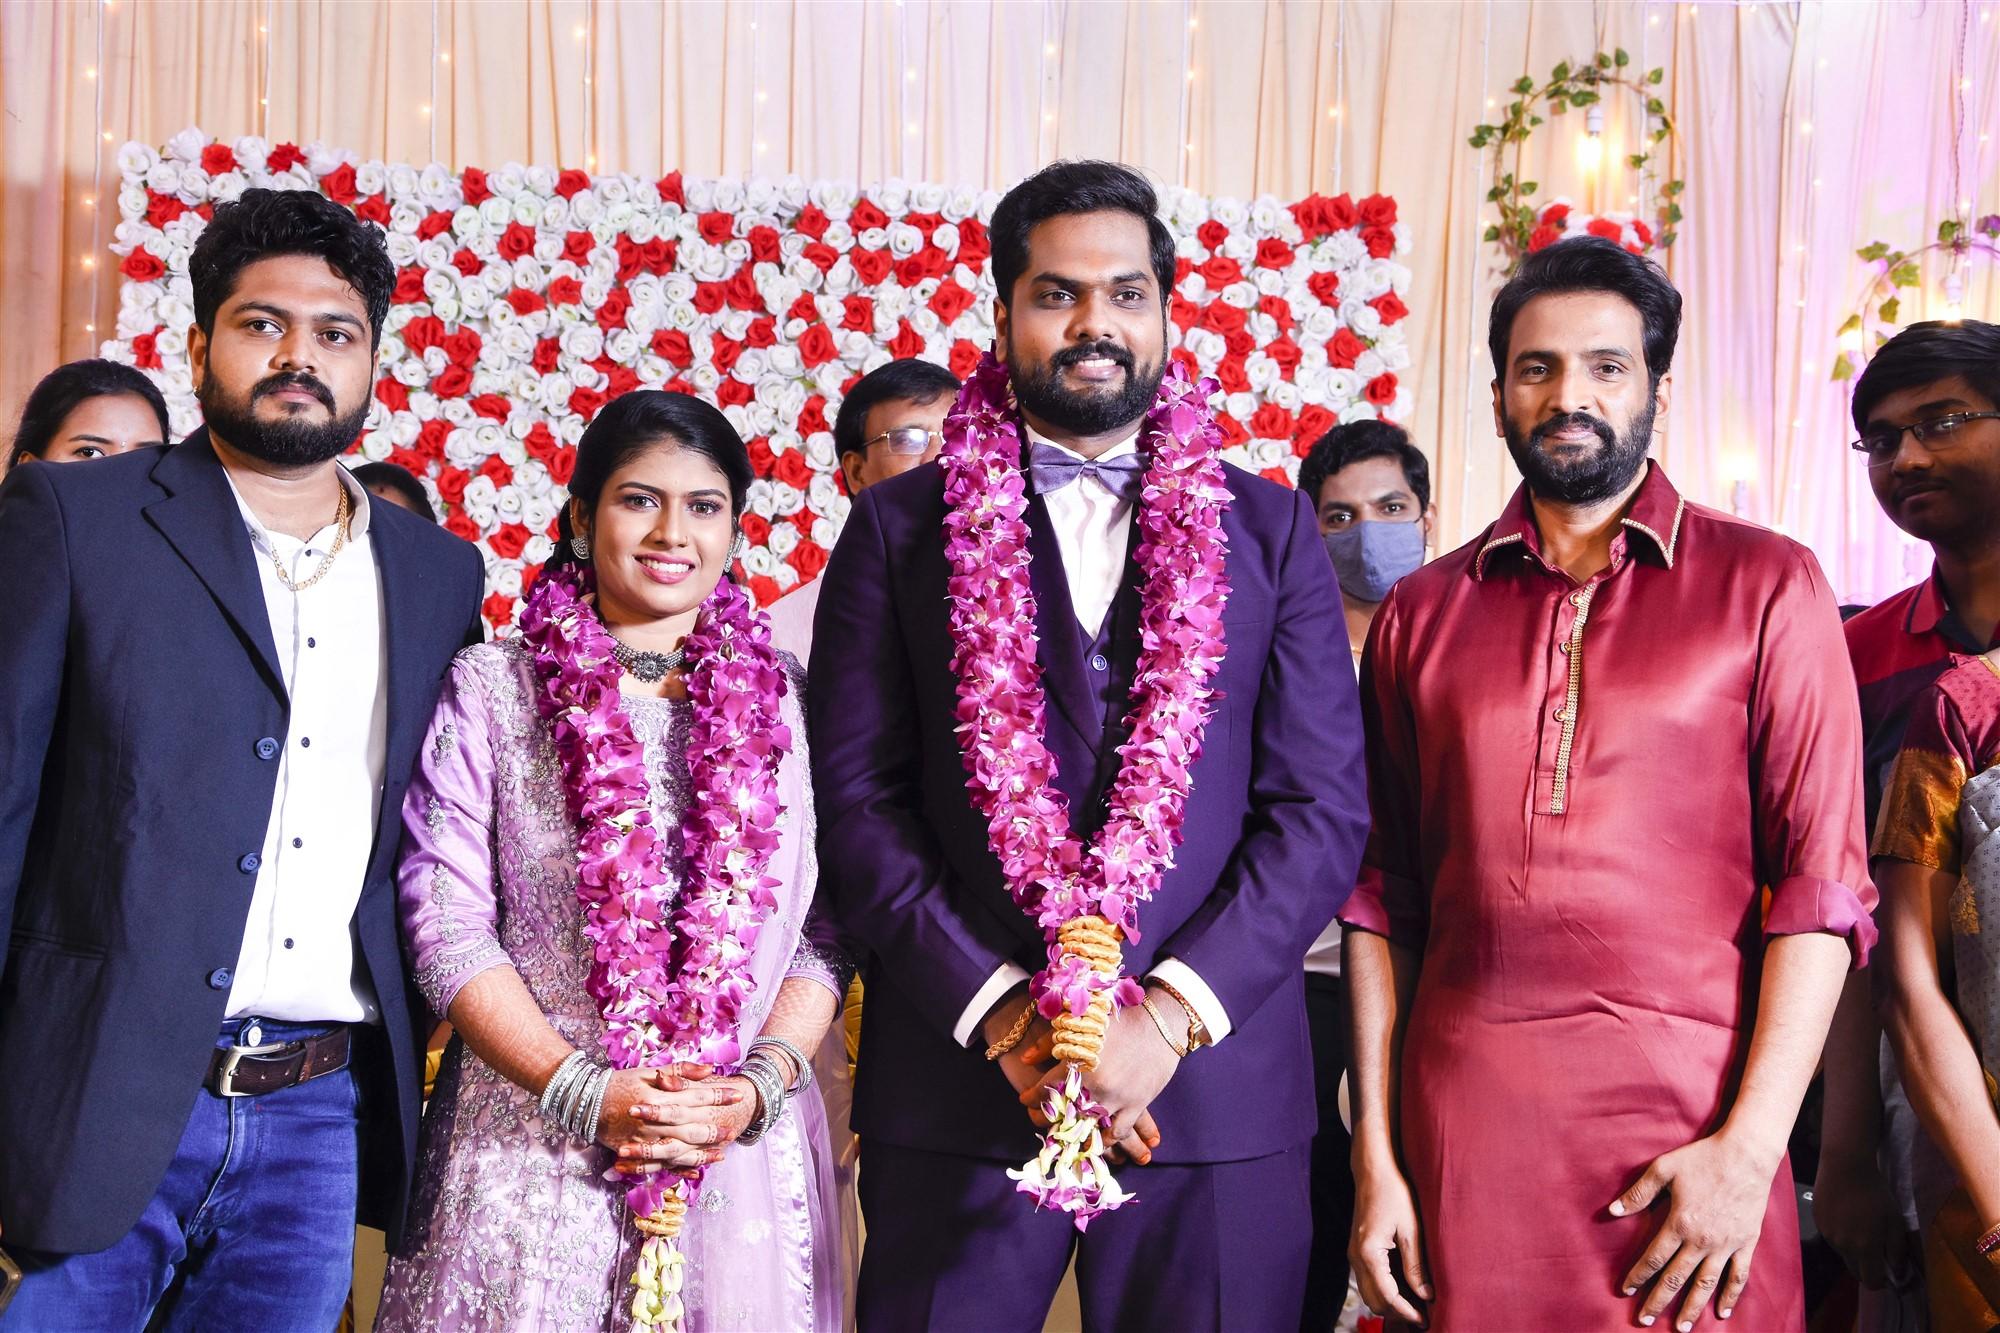 Actor Santhanam @ Dikkiloona Movie Director Karthik Yogi Wedding Images HD